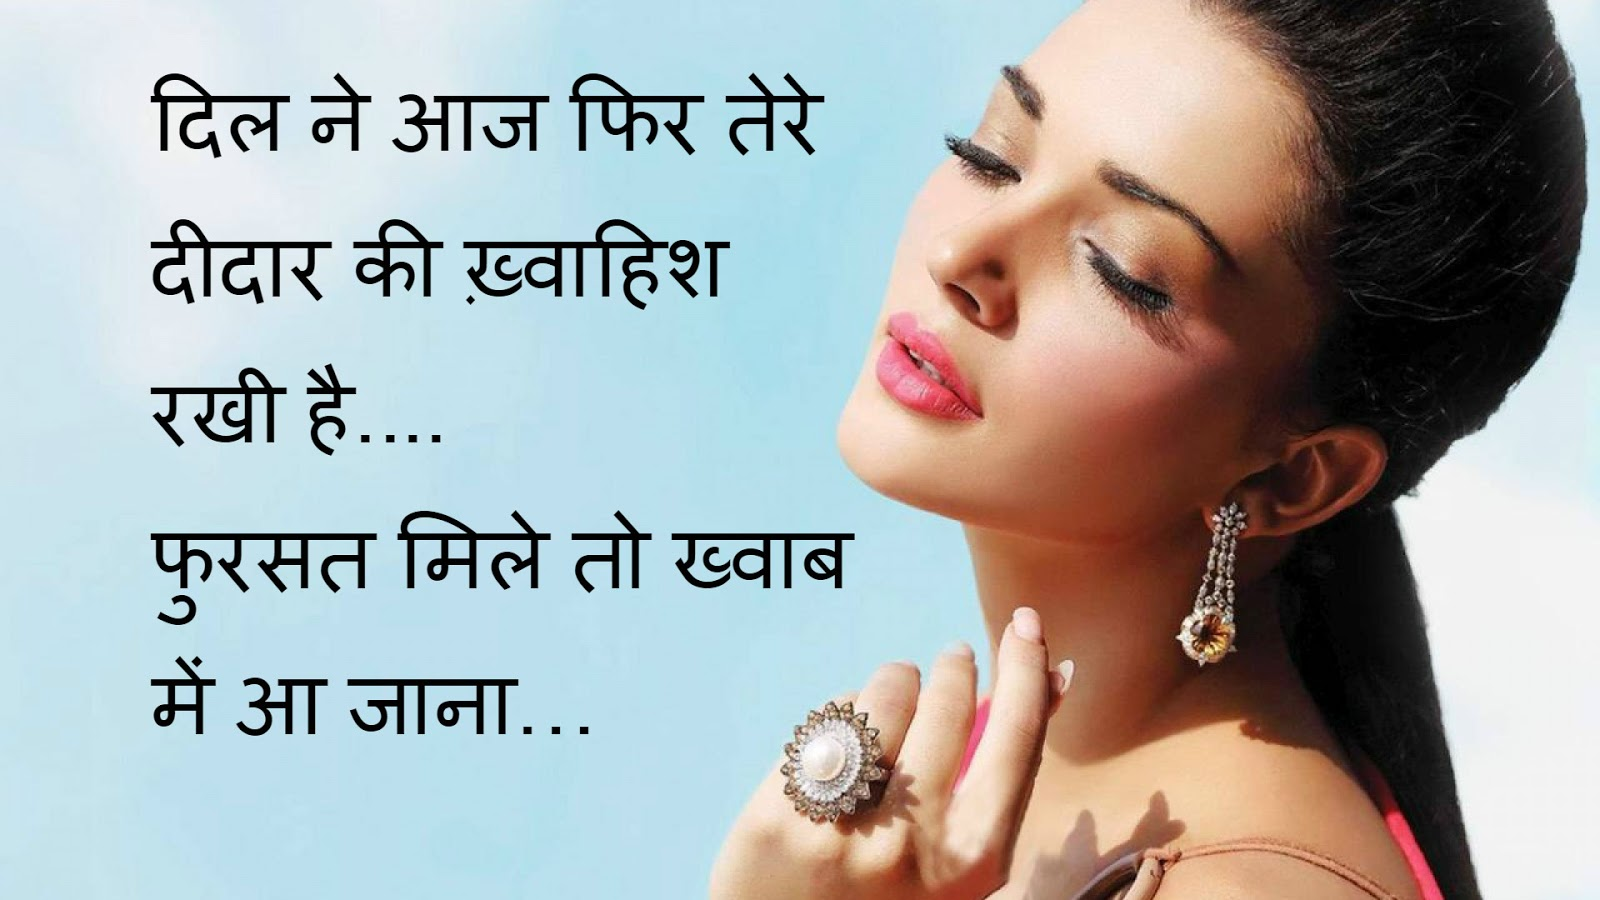 with picture,urdu shayari wallpaper,love shayari urdu,sad love,bewafa ...